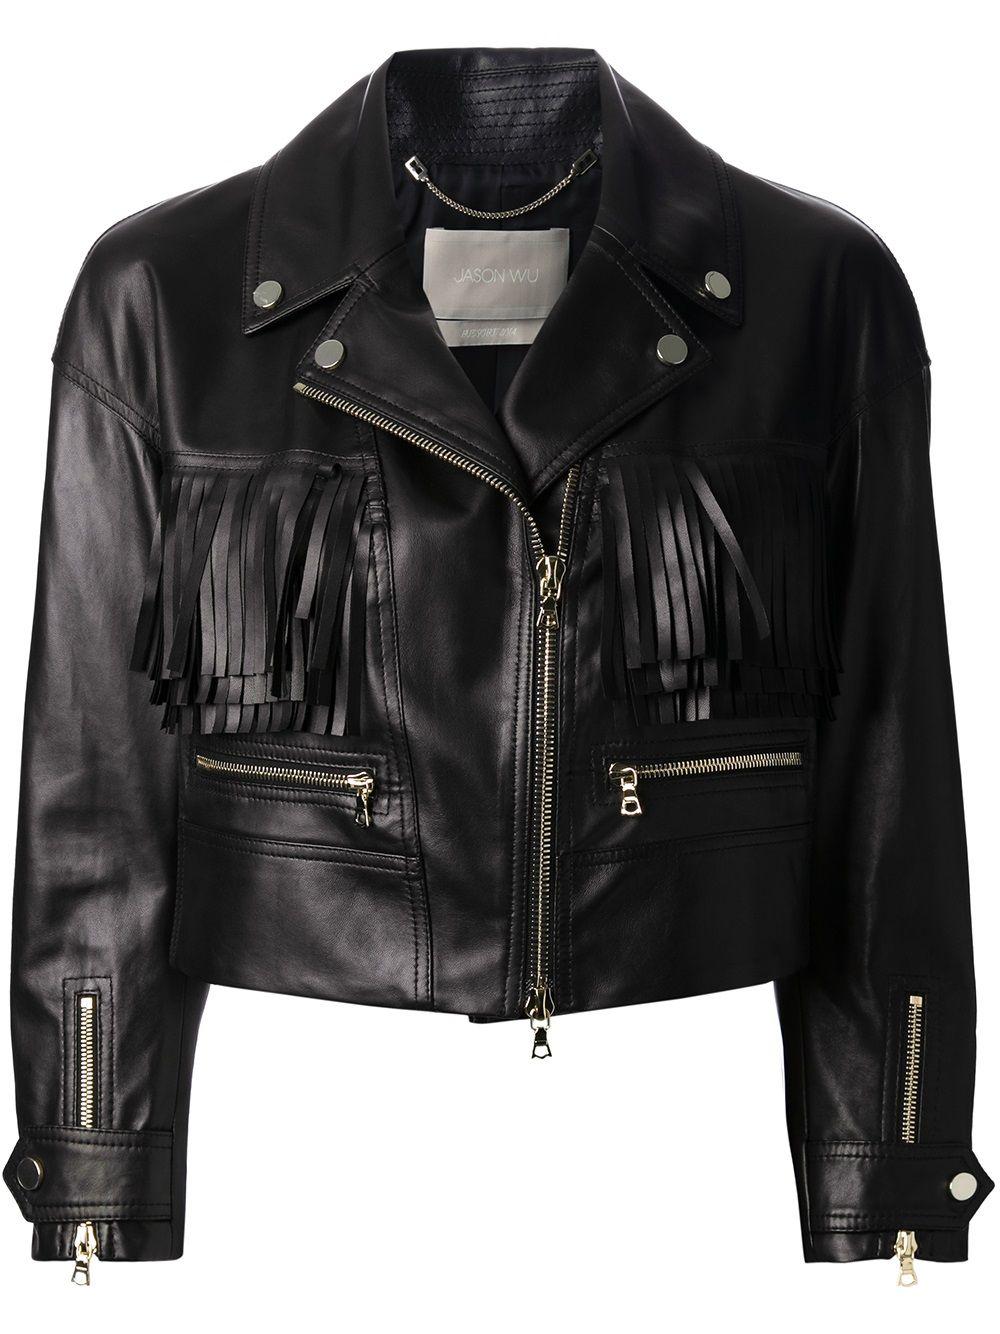 Jason Wu Cropped Biker Jacket Cropped Biker Jacket Leather Jackets Women Designer Leather Jackets [ 1334 x 1000 Pixel ]